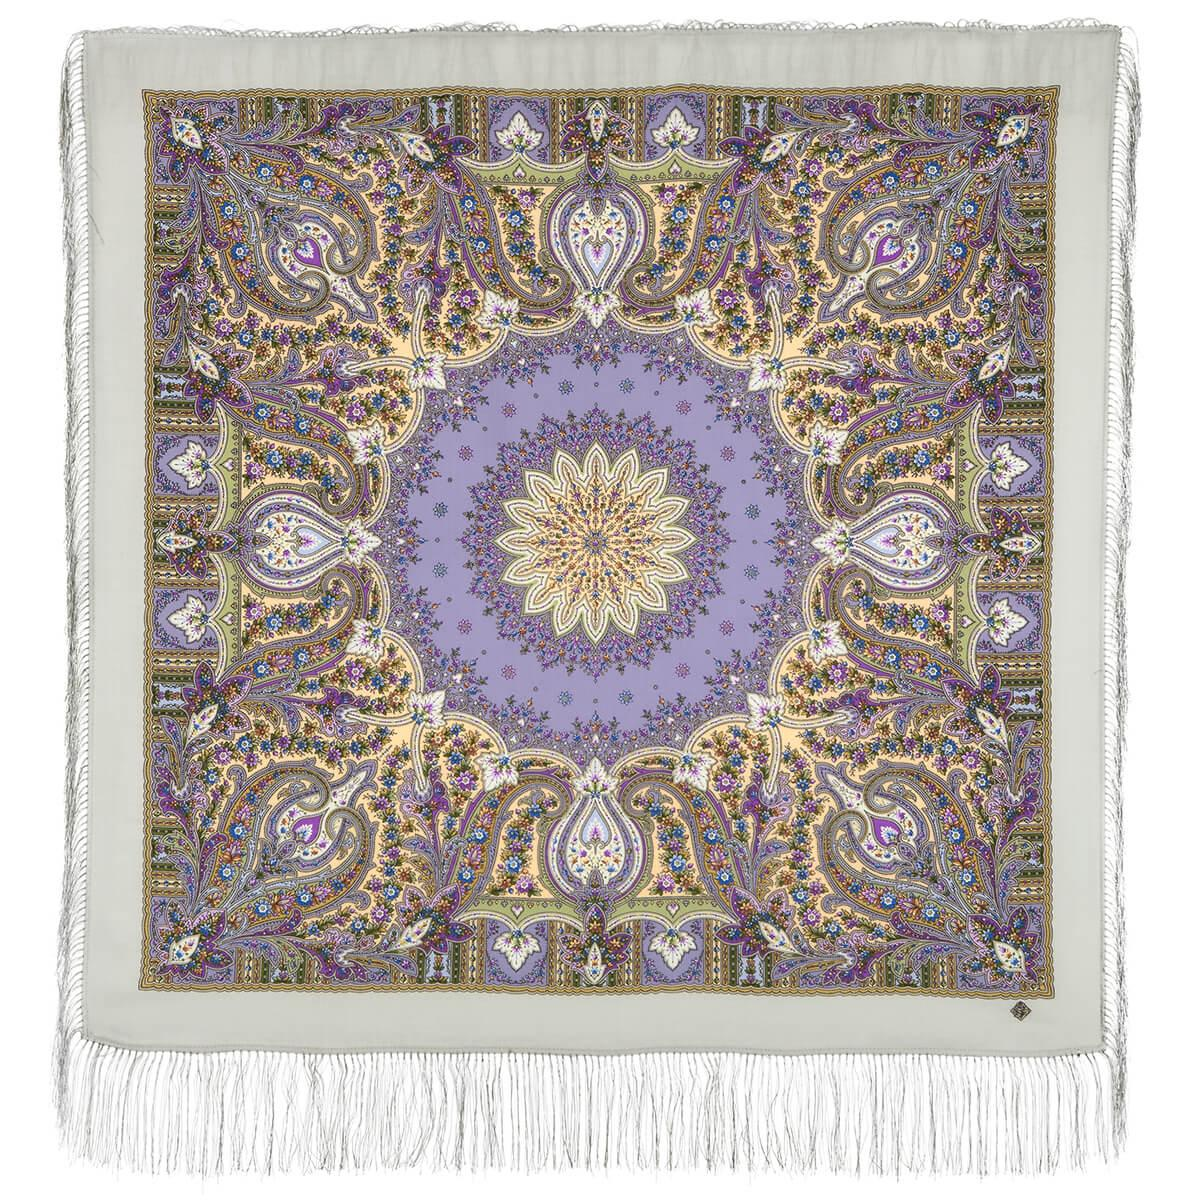 Павлопосадский платок Дикий мед 1712-4 (110х110 см)